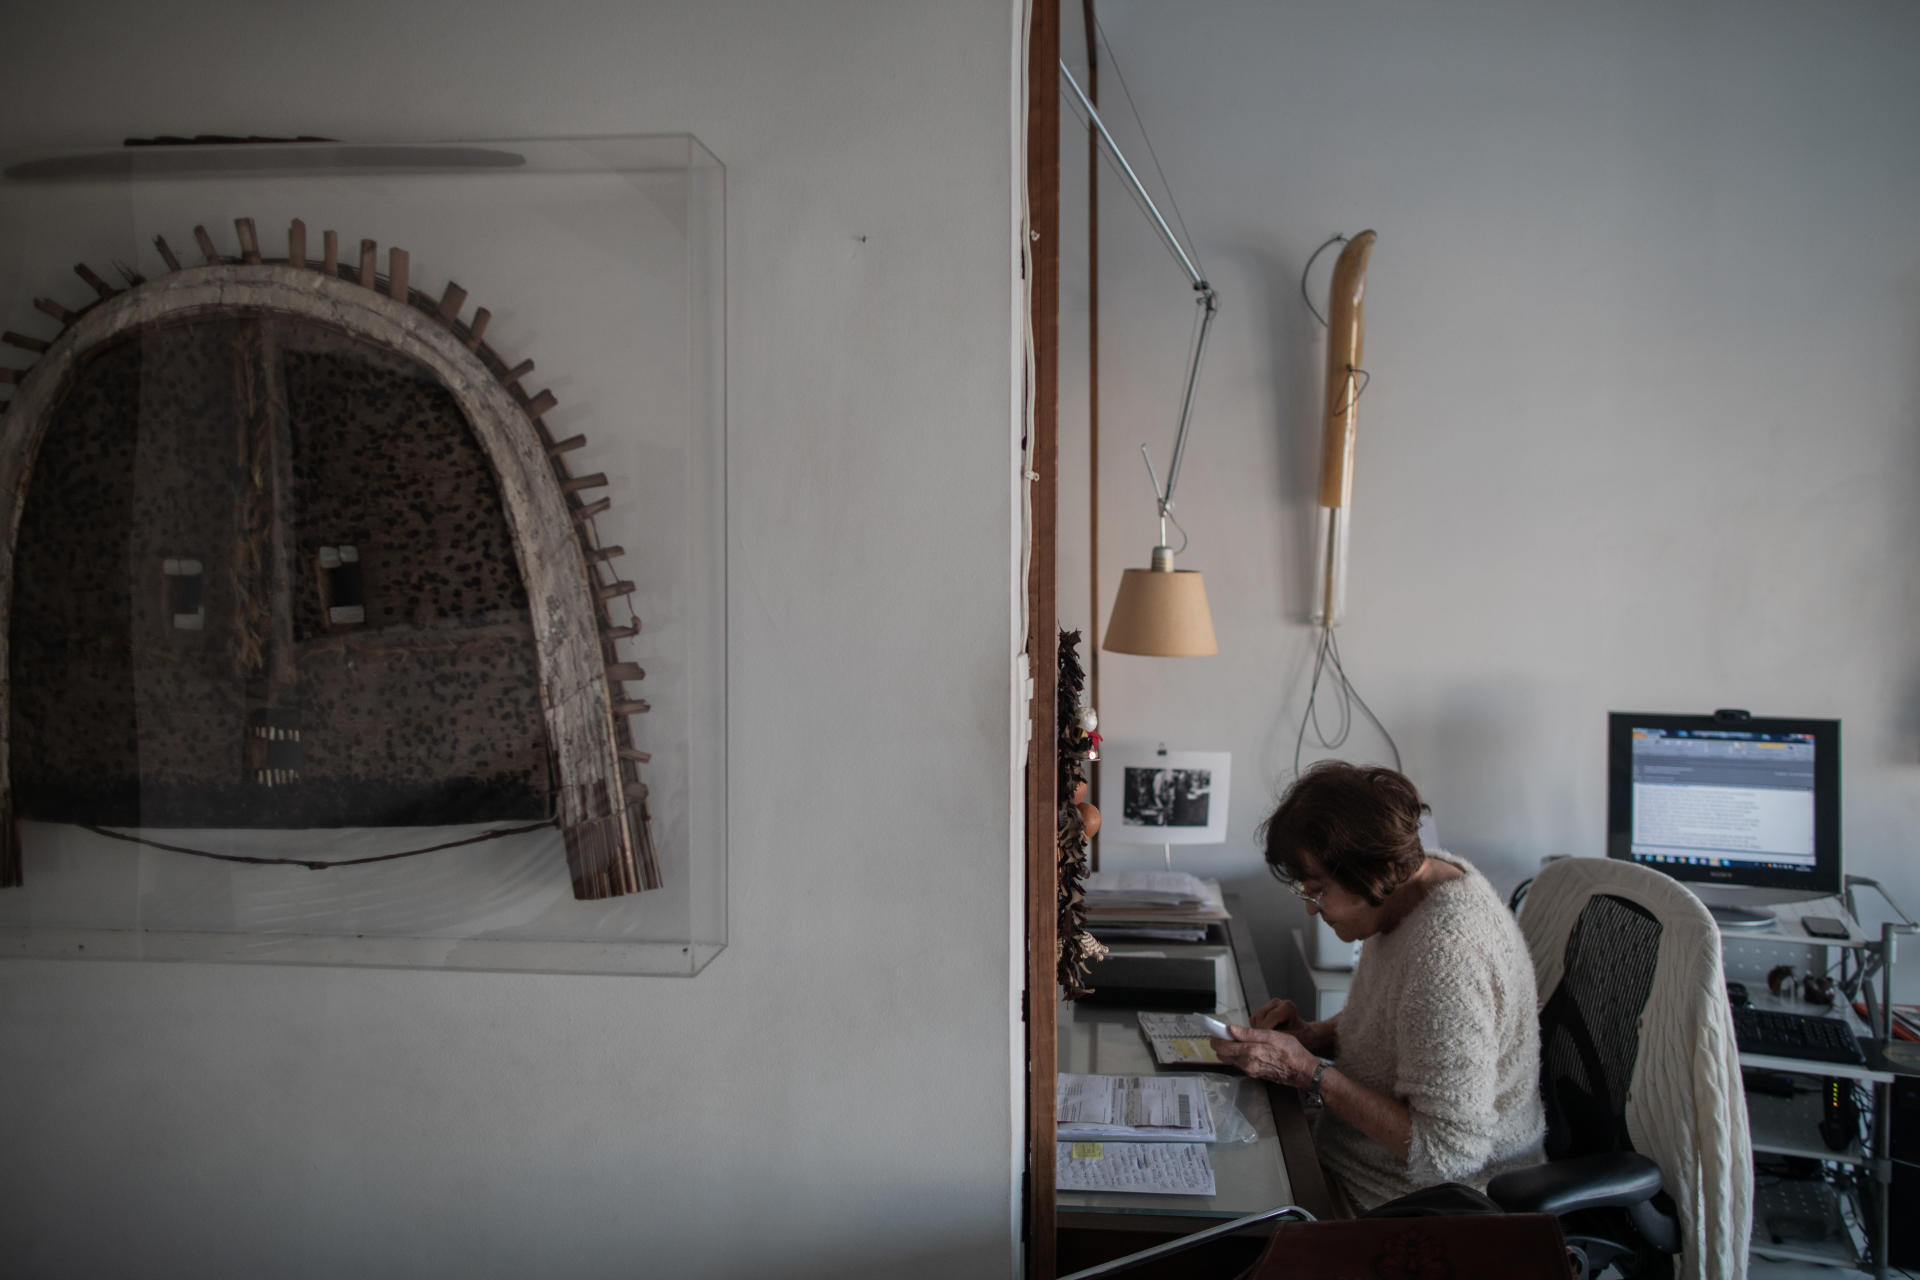 Claudia Andujar, dans son appartement de Sao Paulo, le 24 juillet 2019